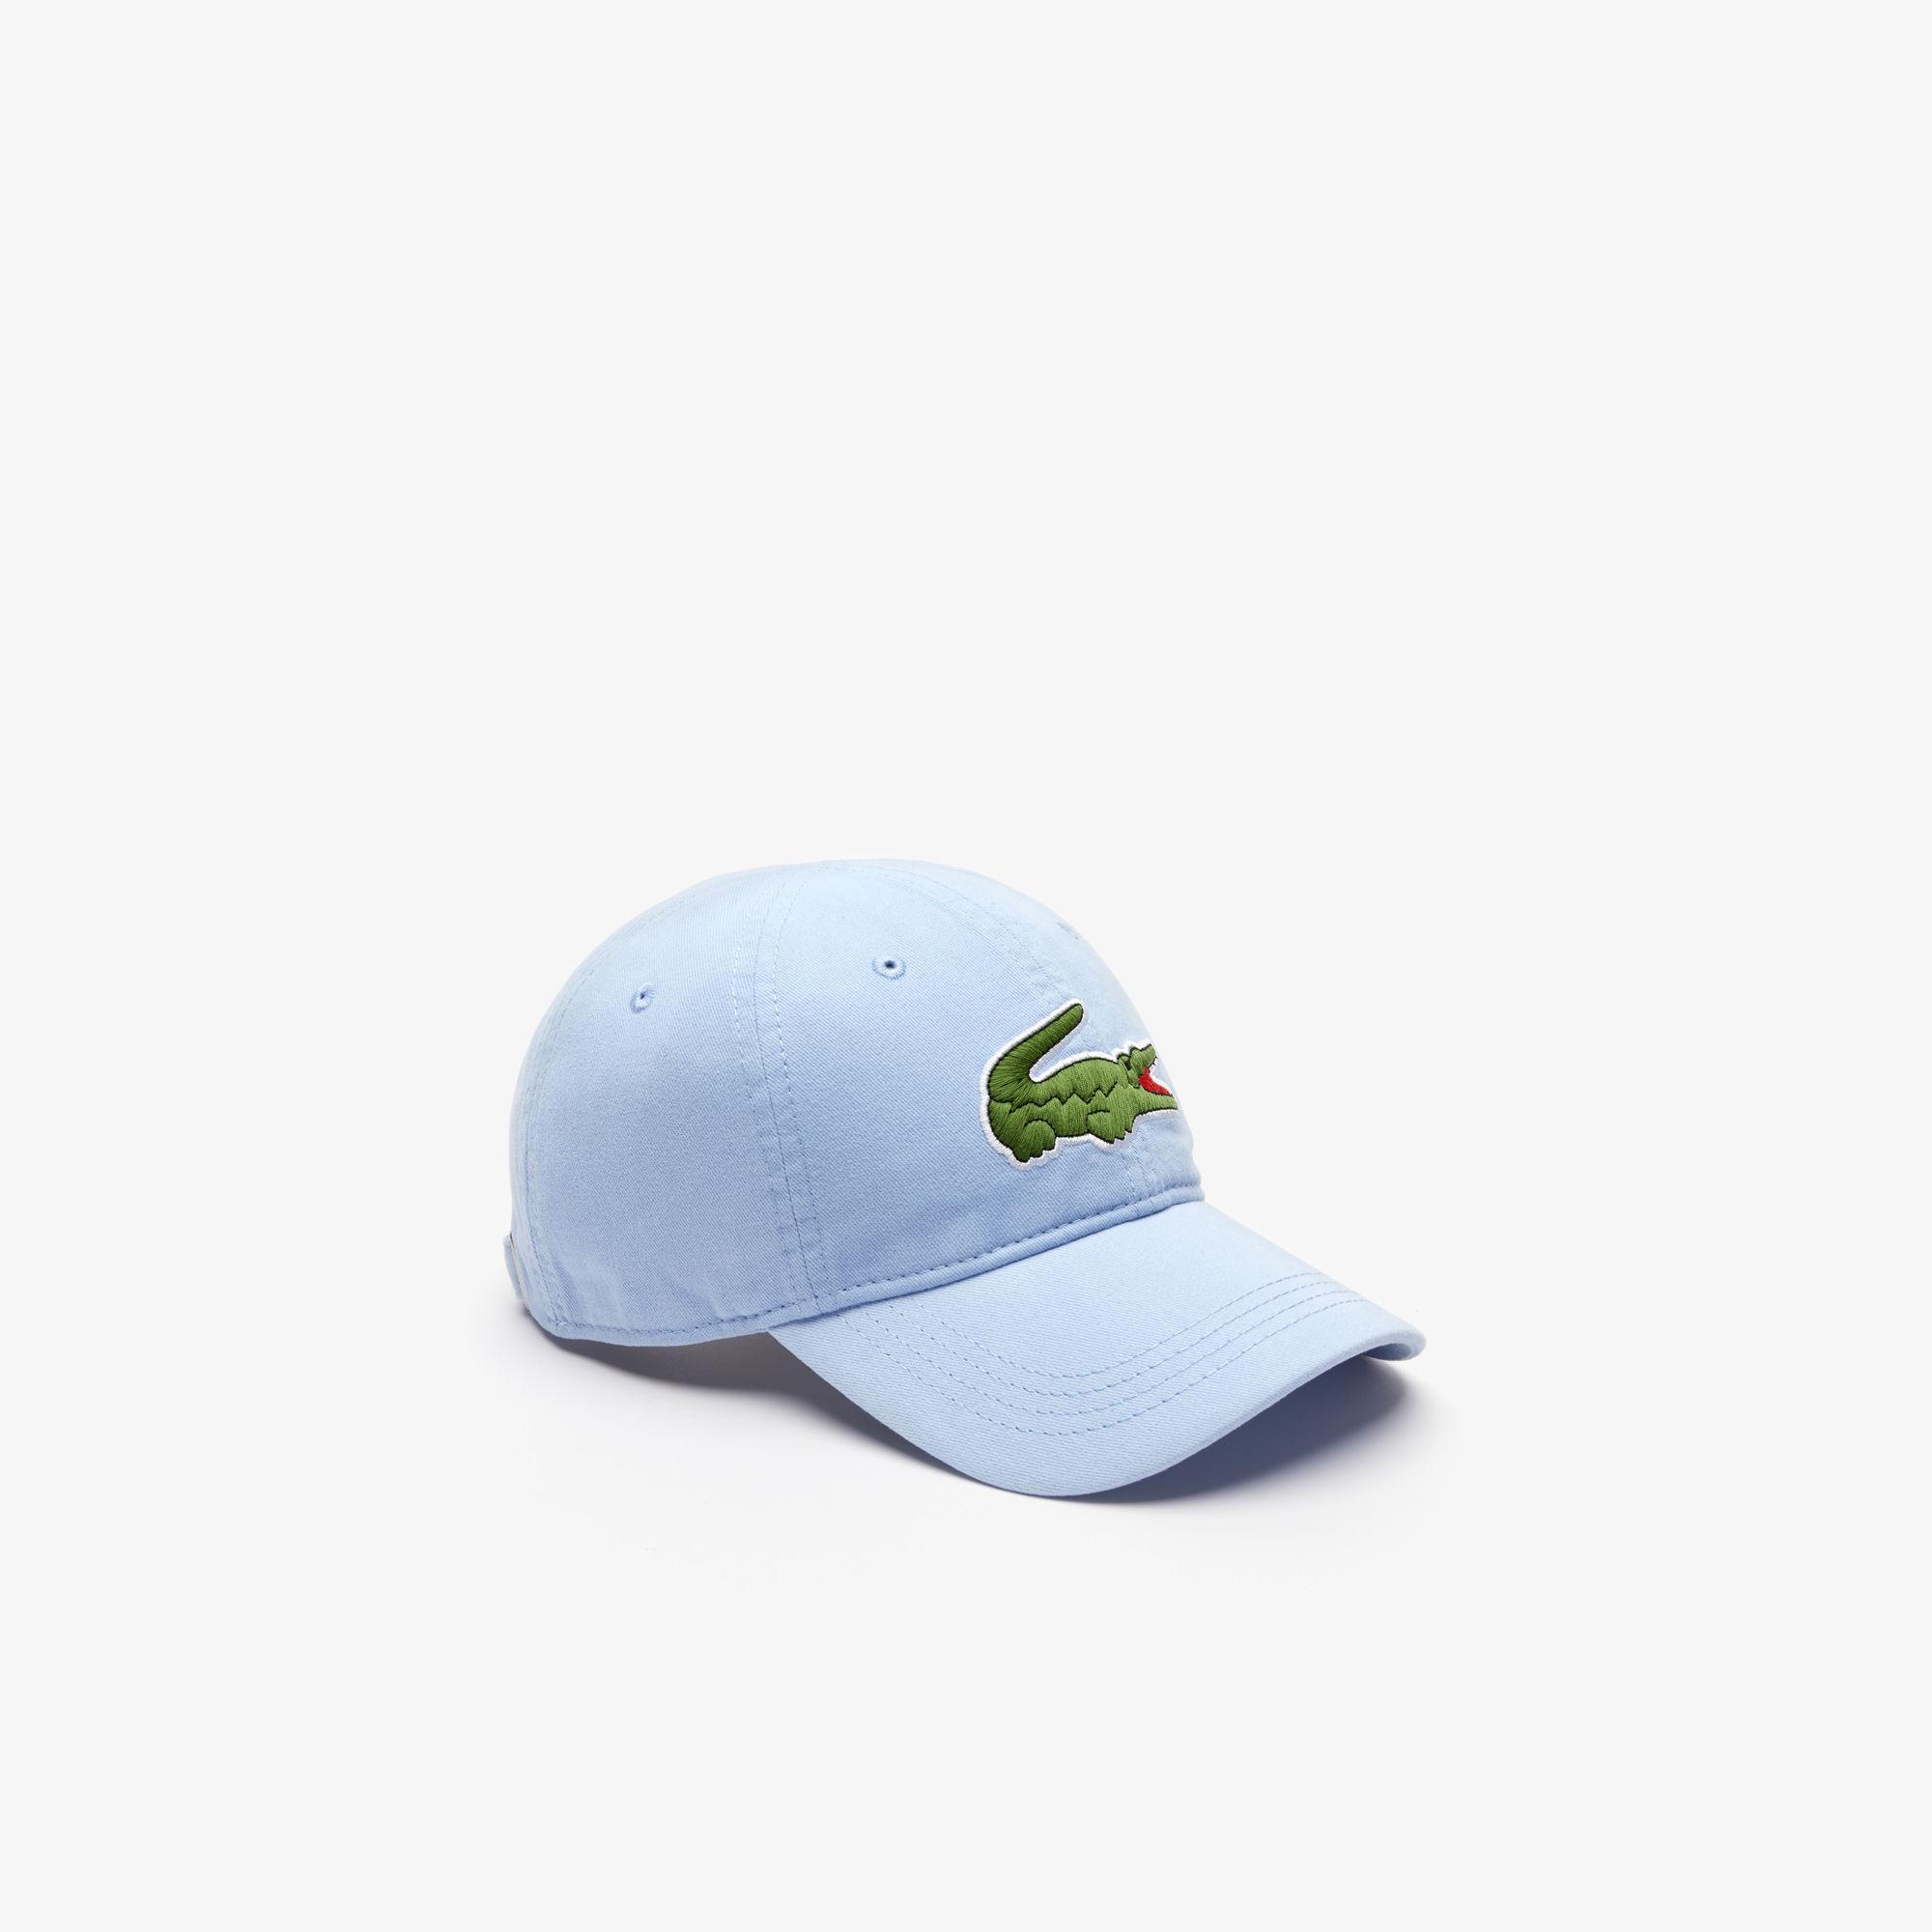 3d9bab33315b4e Lyst - Lacoste Big Croc Gabardine Cap in Blue for Men